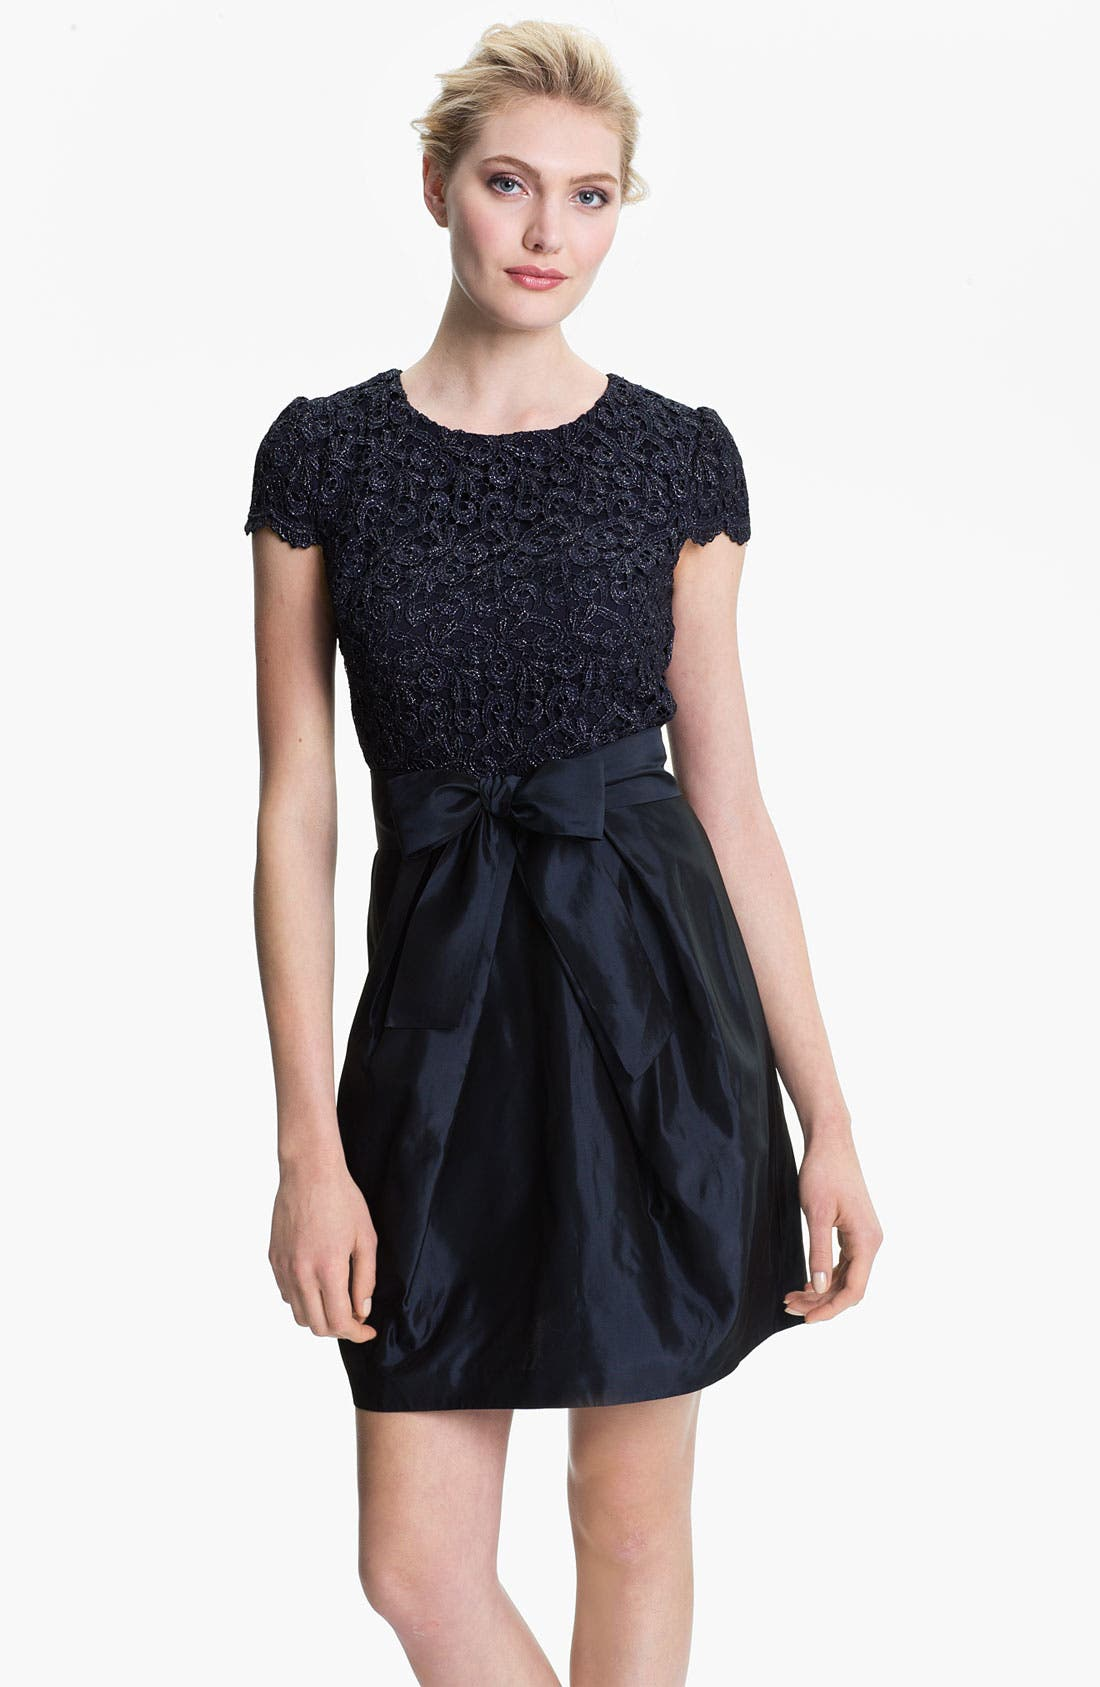 Main Image - Suzi Chin for Maggy Boutique Lace & Taffeta Dress